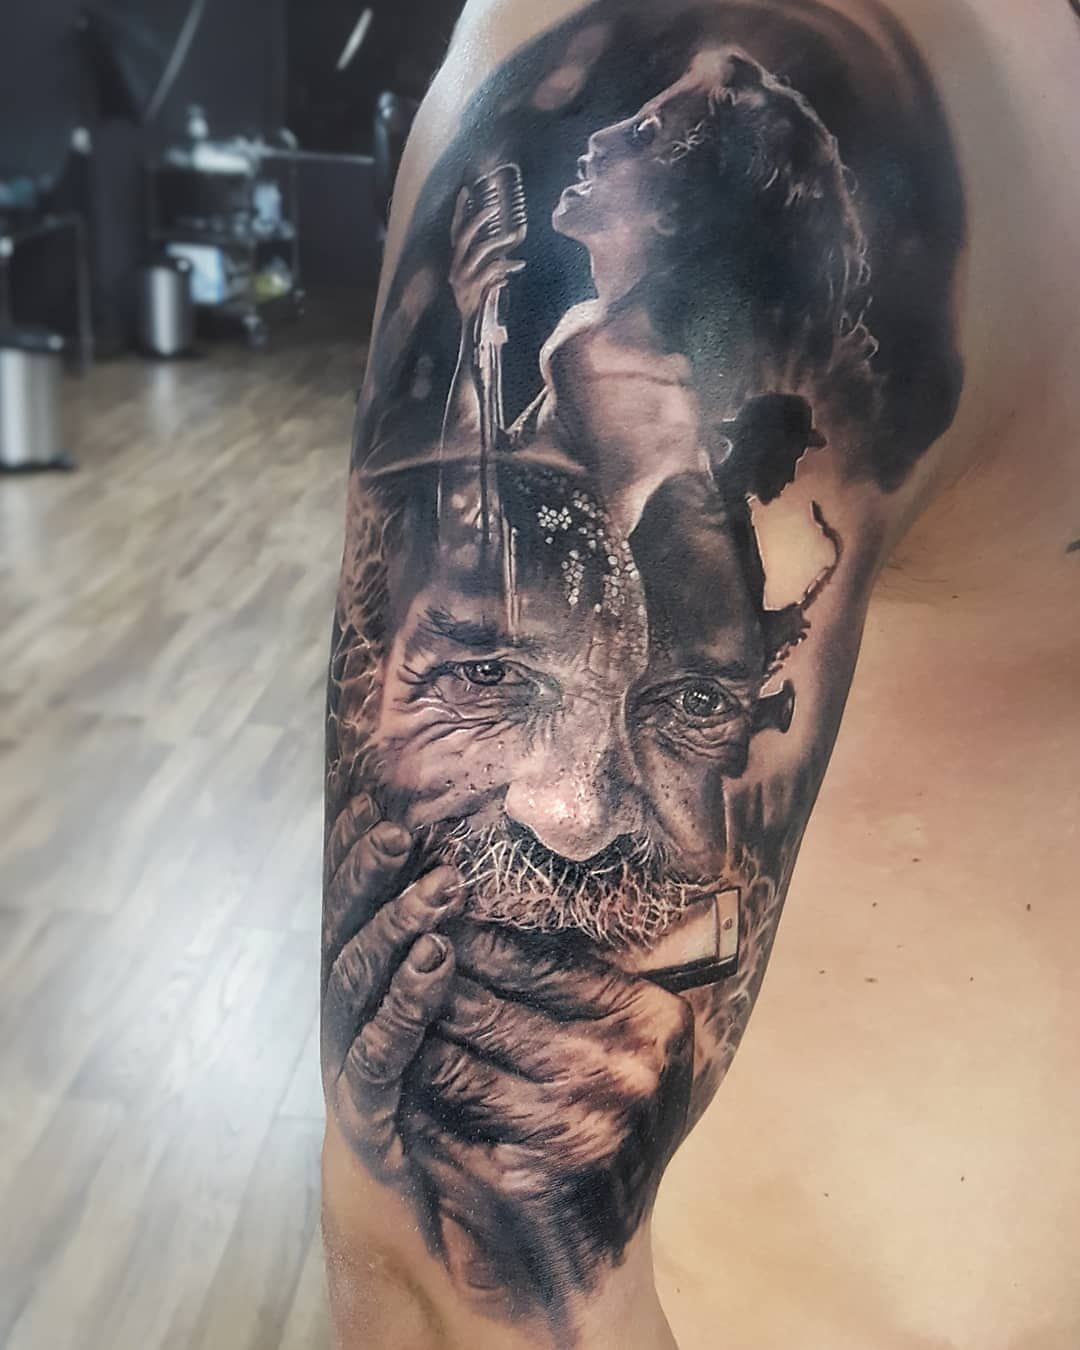 "@inkedtime_vk on Instagram: ""Artist: @elmagotattoo  . . . #tattooworld #tattooartwork #neotraditionaltattoos #tattoosp #tattooinkspiration #tattoorealistic #tattoounity…"""